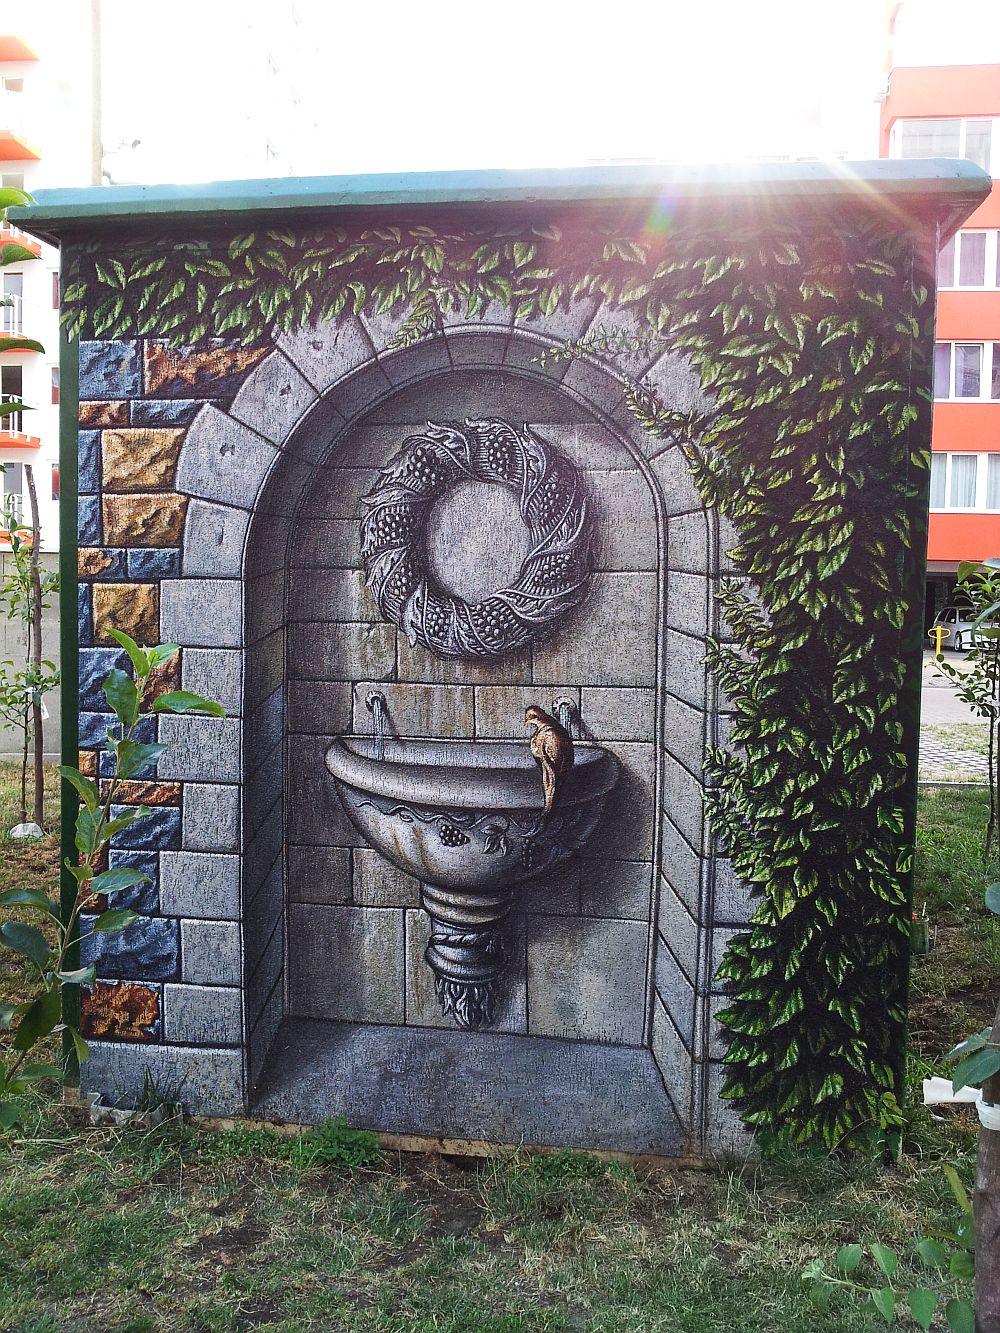 adelaparvu.com despre Sabin Chintoan si pictura urbana, Foto Sabin Chintoan (20)